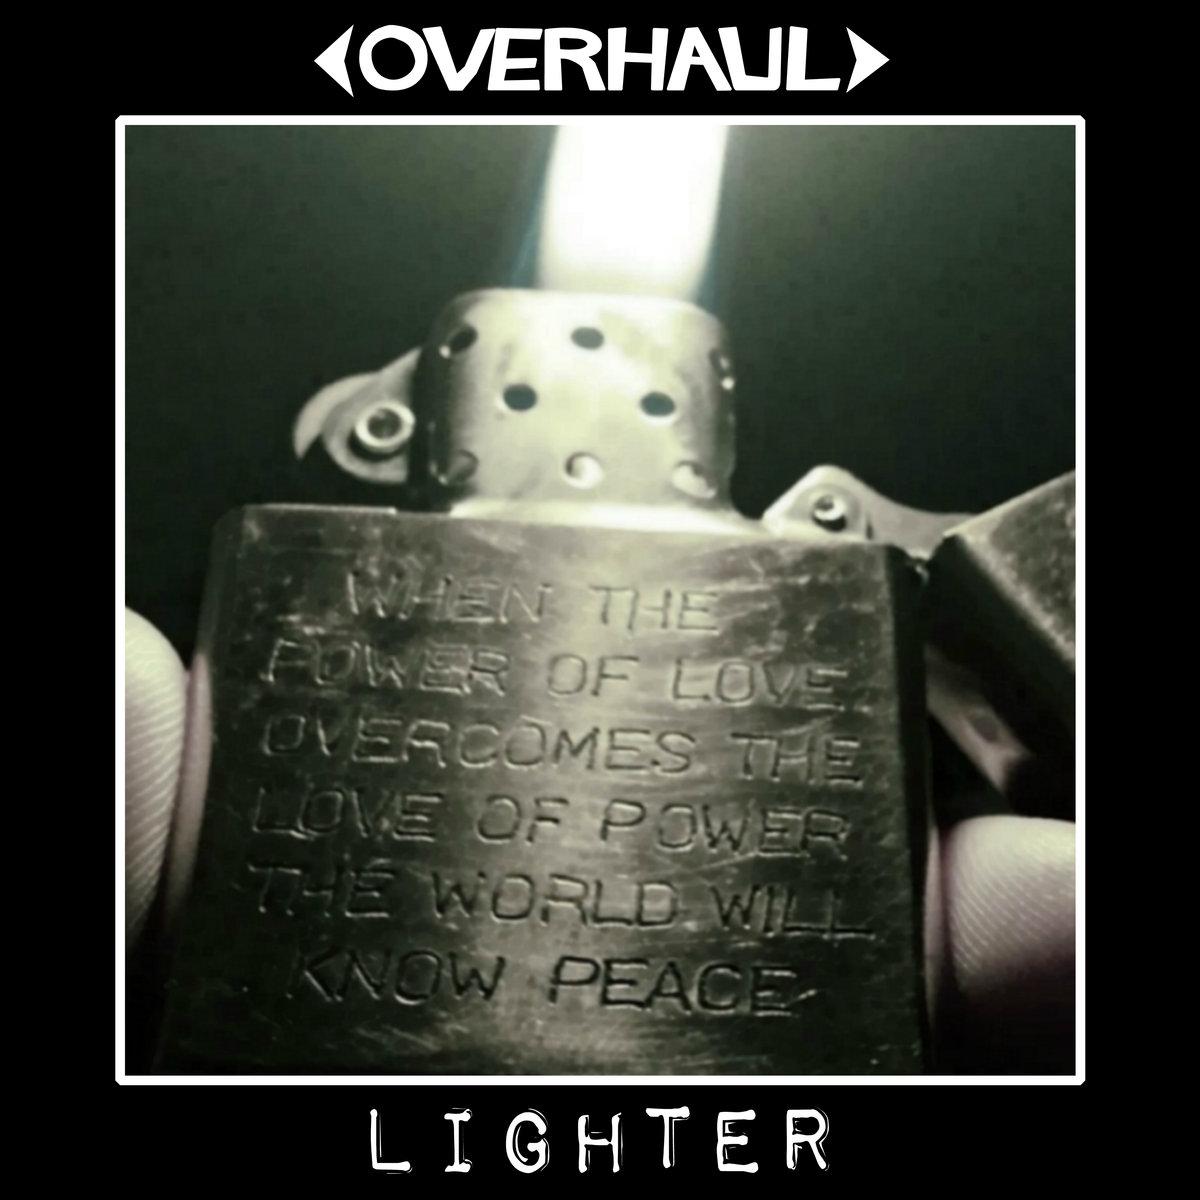 Overhaul Album 'Lighter' Artwork